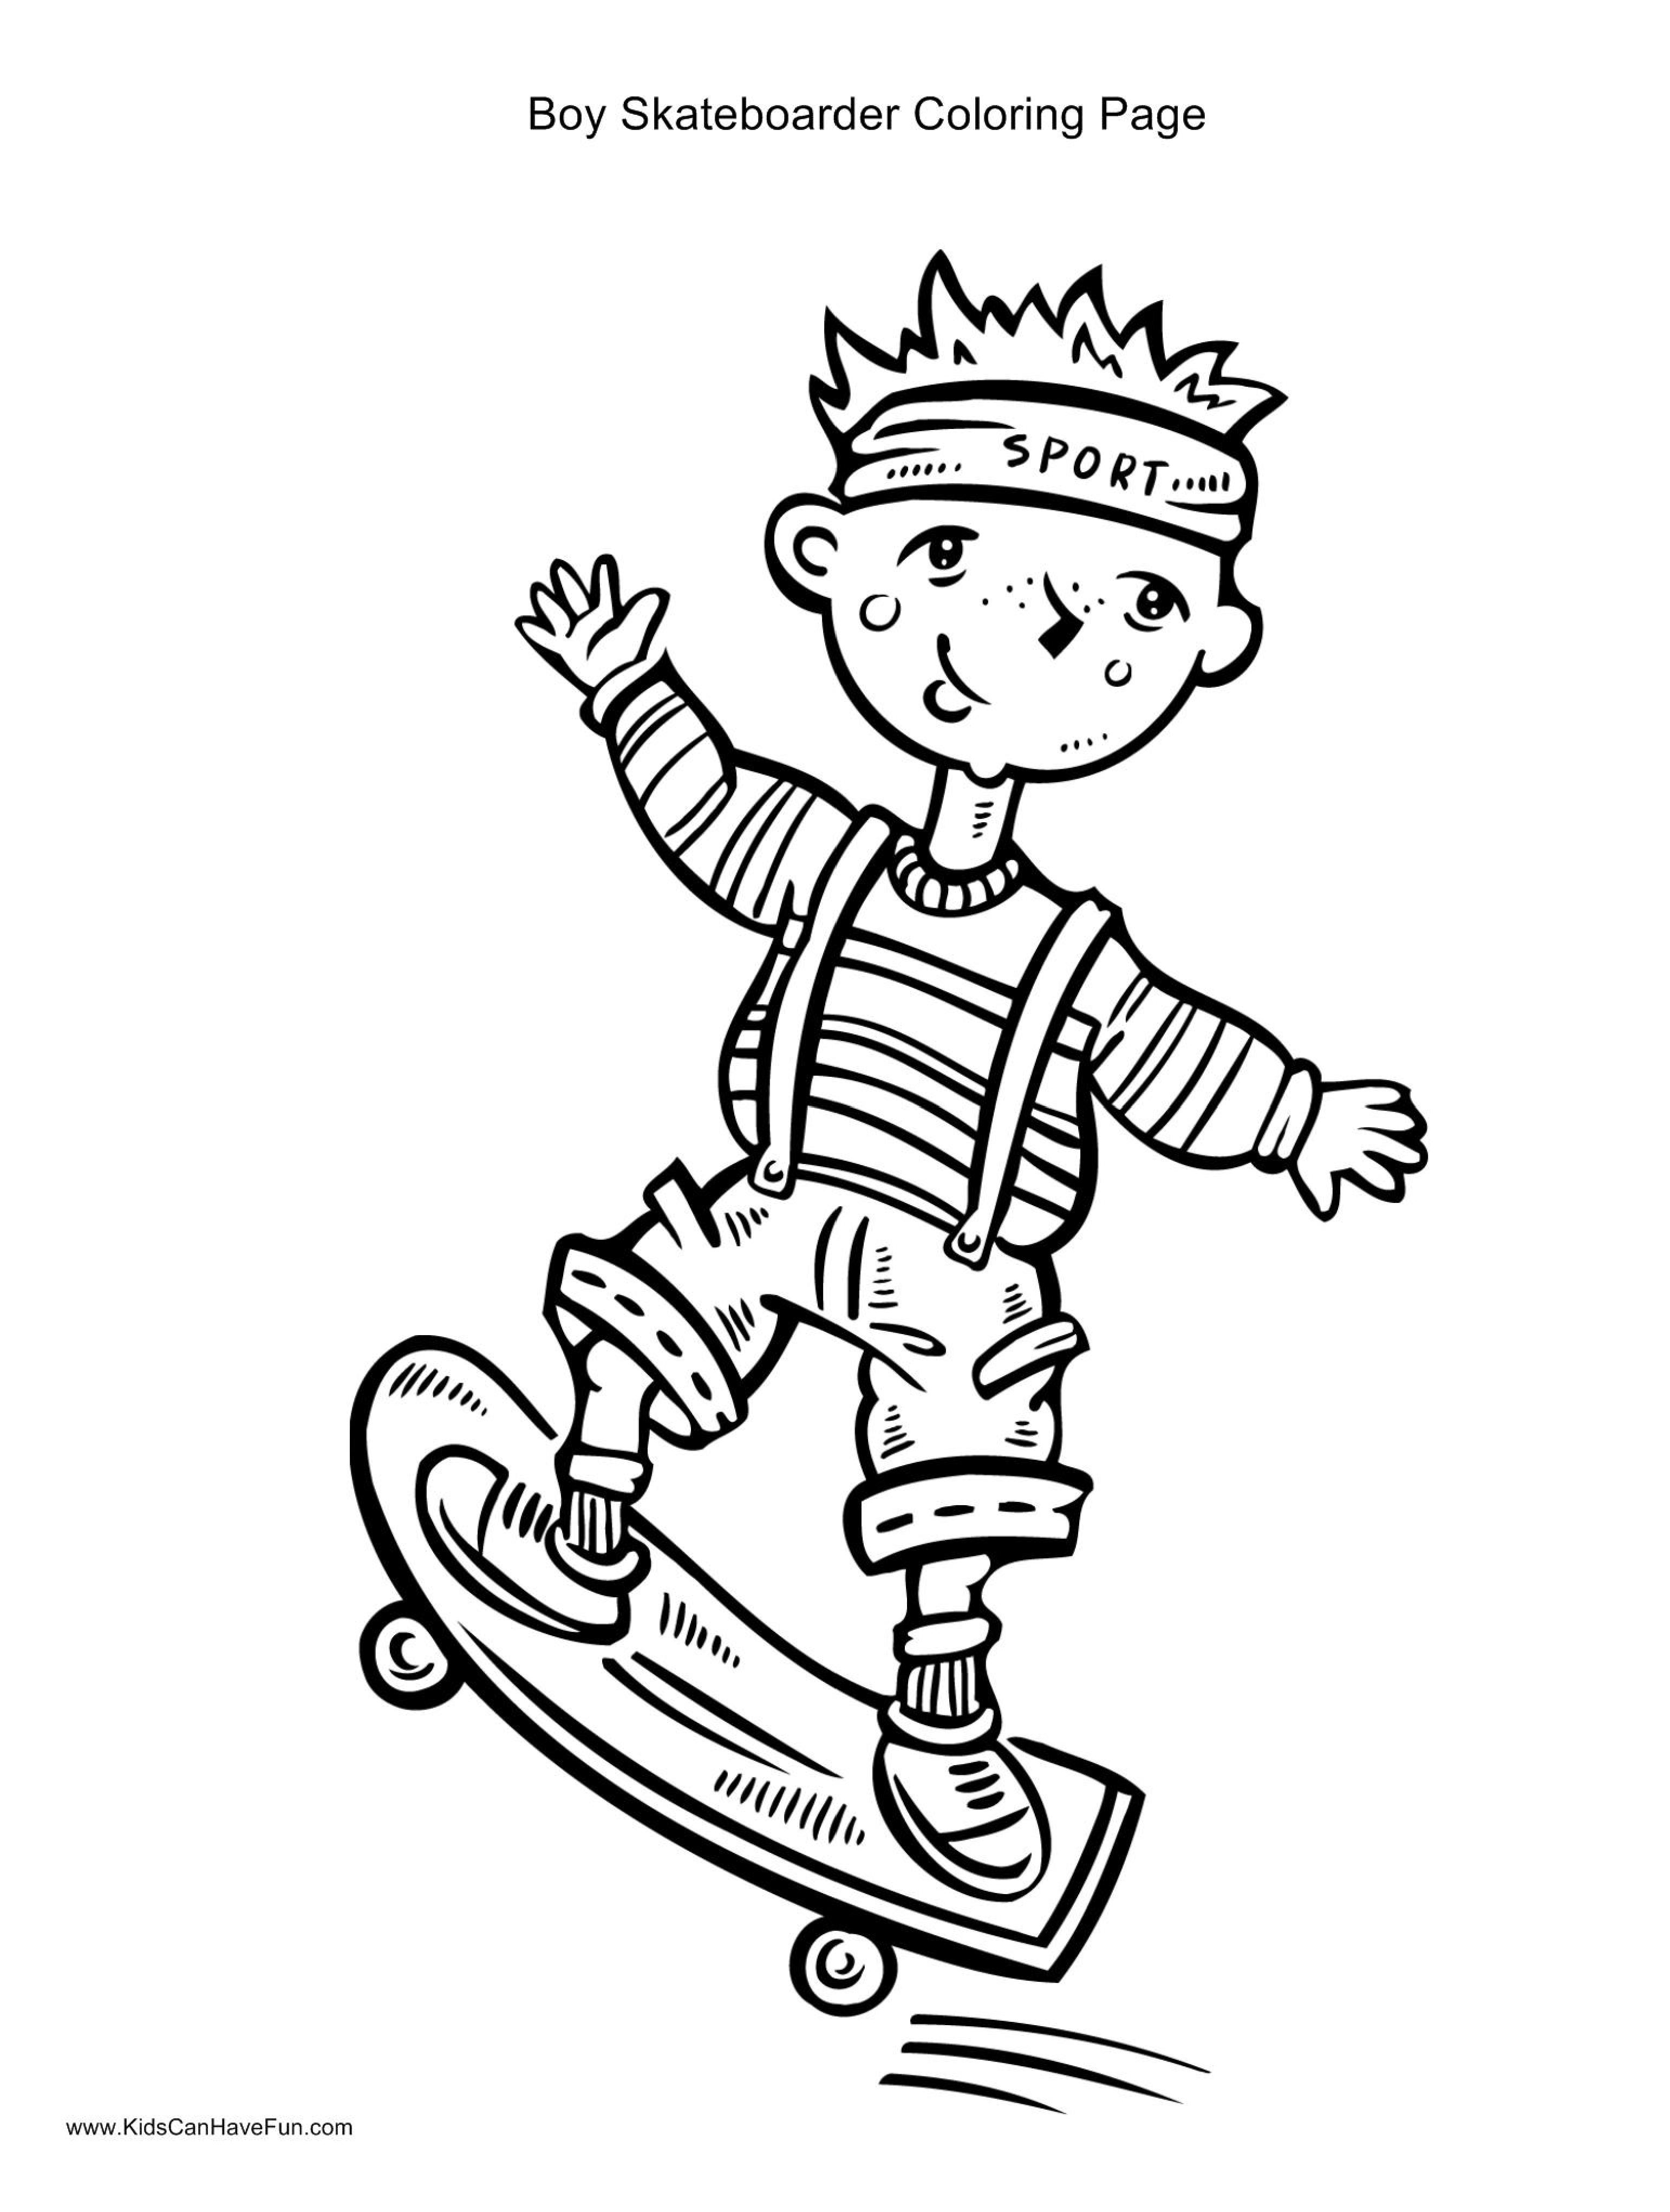 Skateboarder Drawing at GetDrawings | Free download